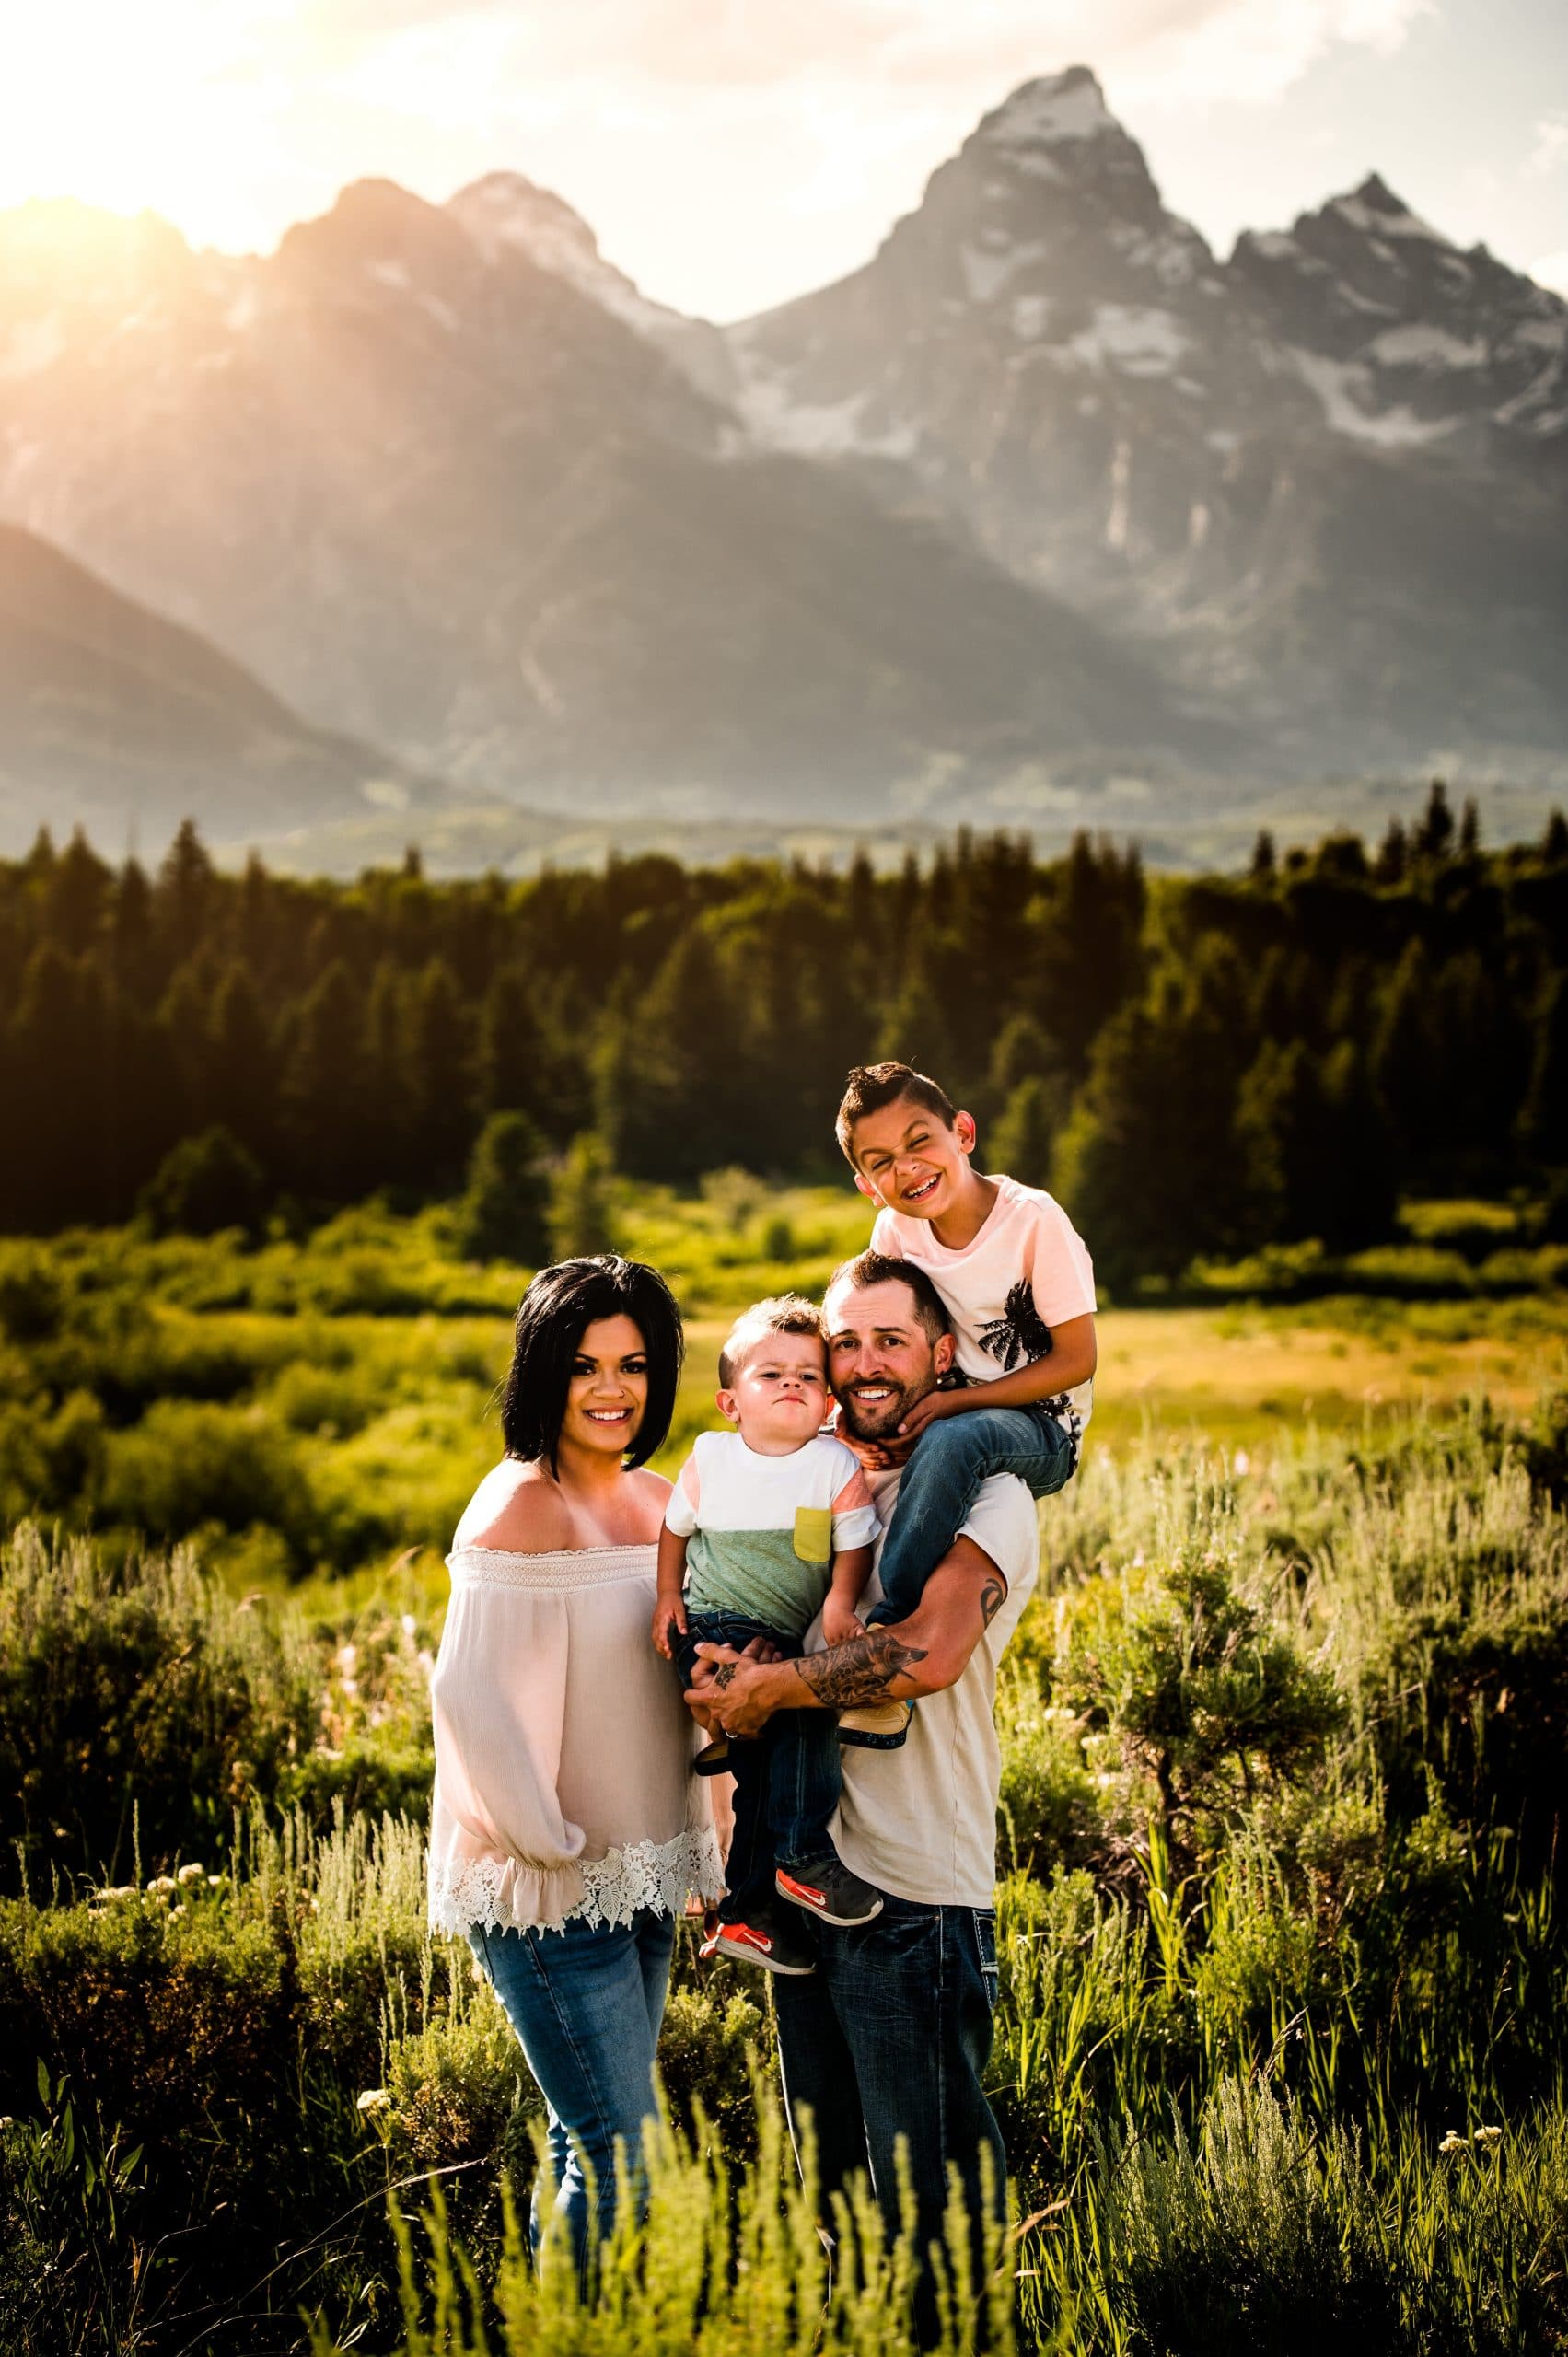 Lexi's family